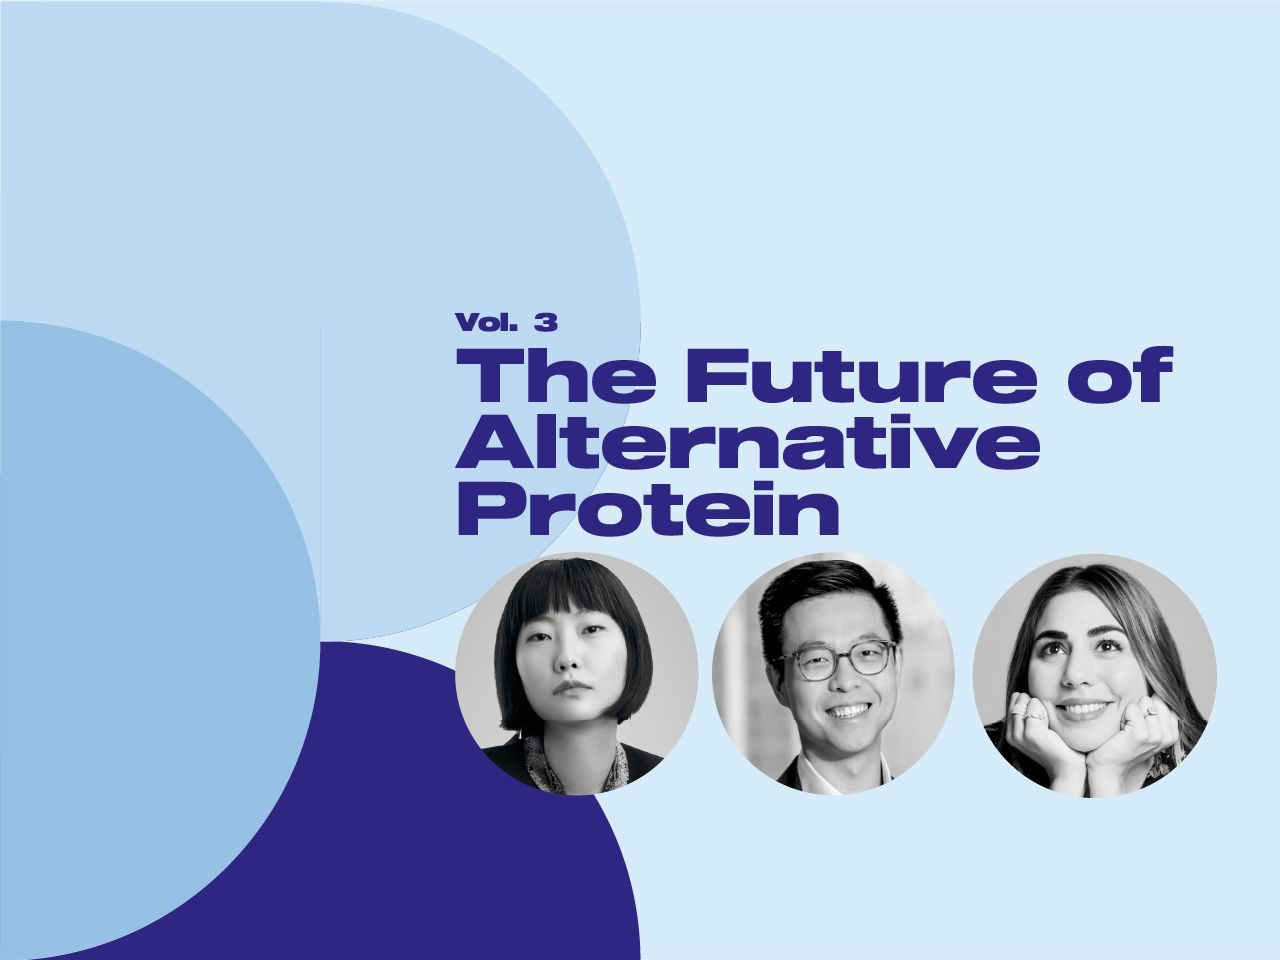 Cloud Talk: The Future Of Alternative Protein